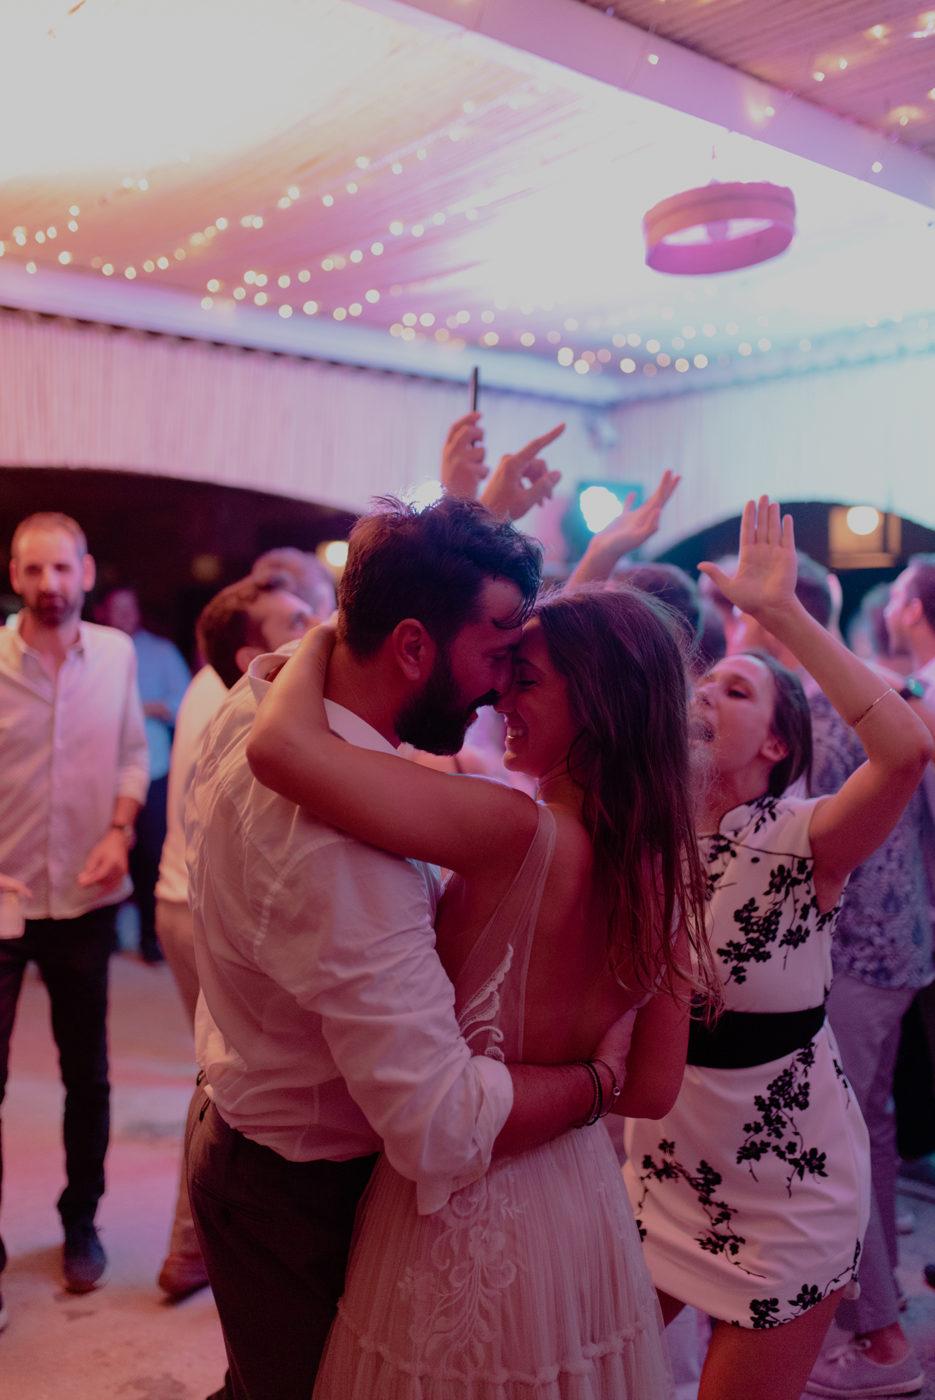 kirill-samarits-wedding-photography-koufonisia-greece-couple-photographer (41)